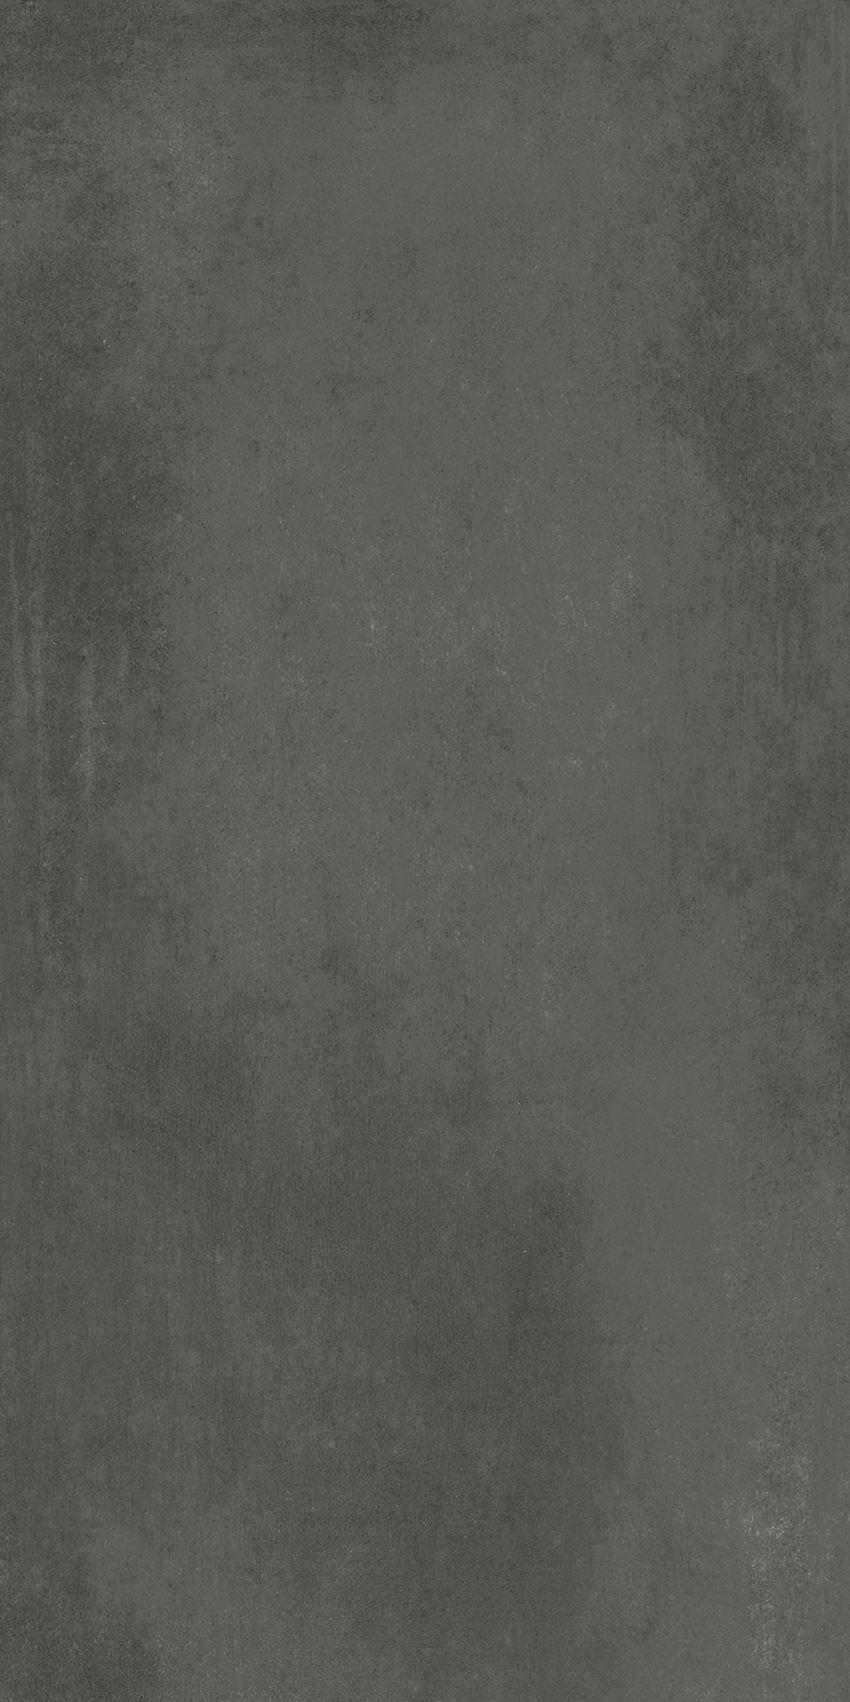 Płytka uniwersalna 59,8x119,8 cm Opoczno Grava Graphite